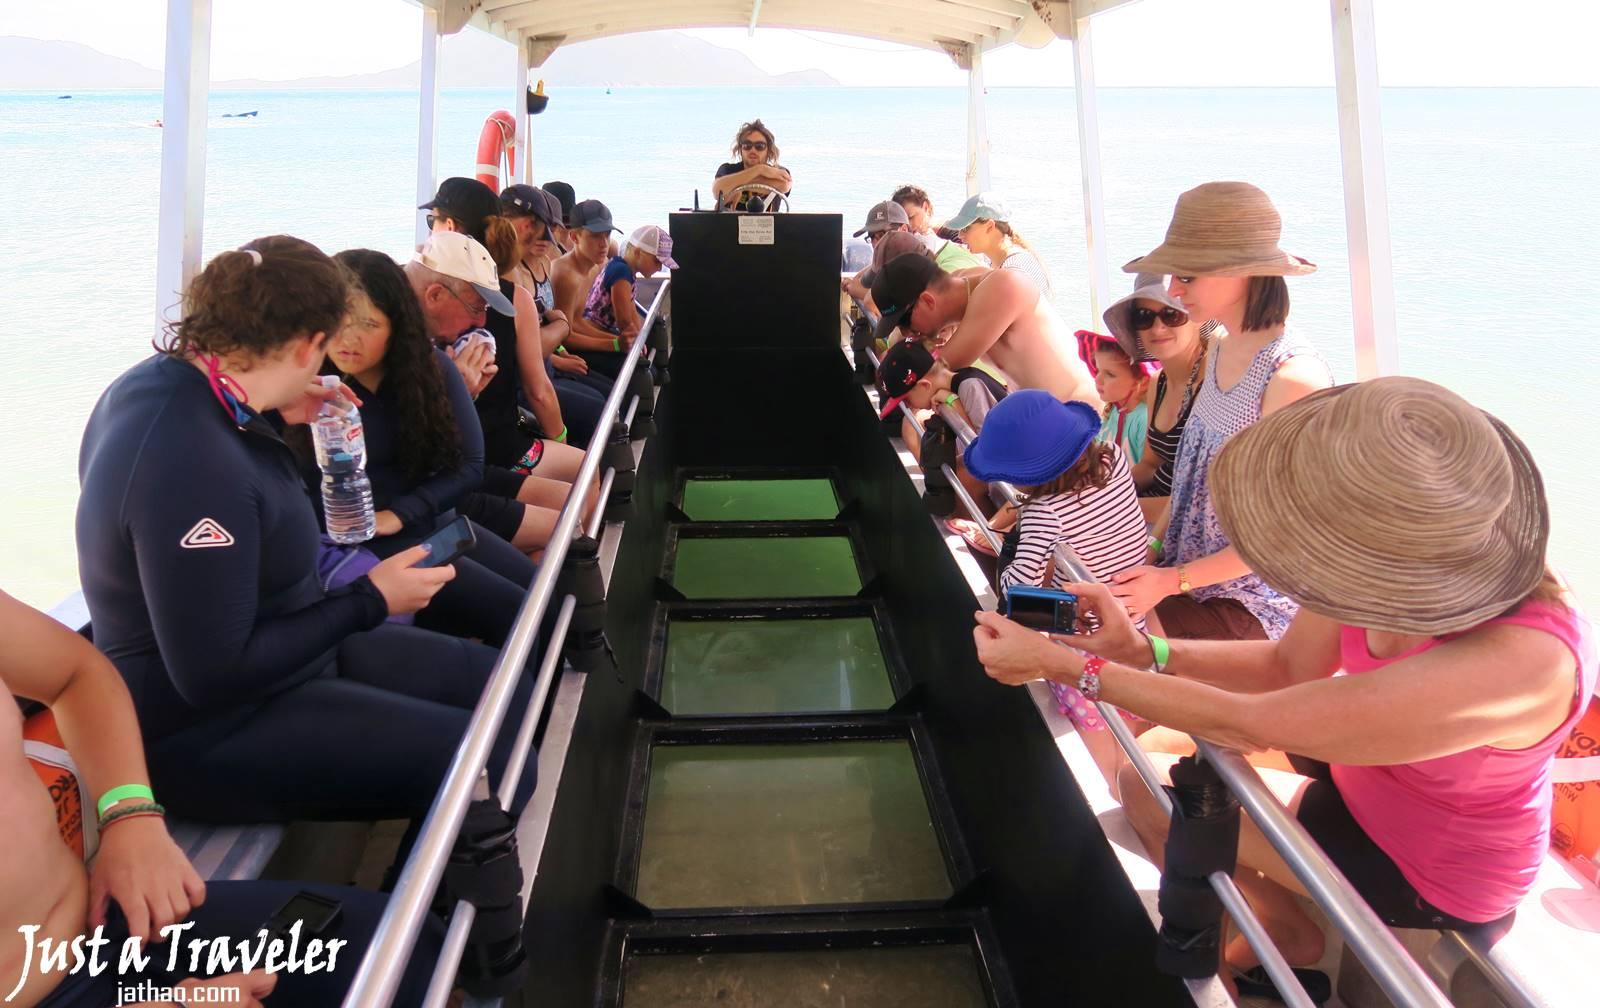 凱恩斯-大堡礁-翡翠島-玻璃底船-內堡礁-浮潛-潛水-推薦-旅遊-自由行-澳洲-Carins-Great-Barrier-Reef-Fitzroy-Island-Snorkel-Diving-Travel-Australia